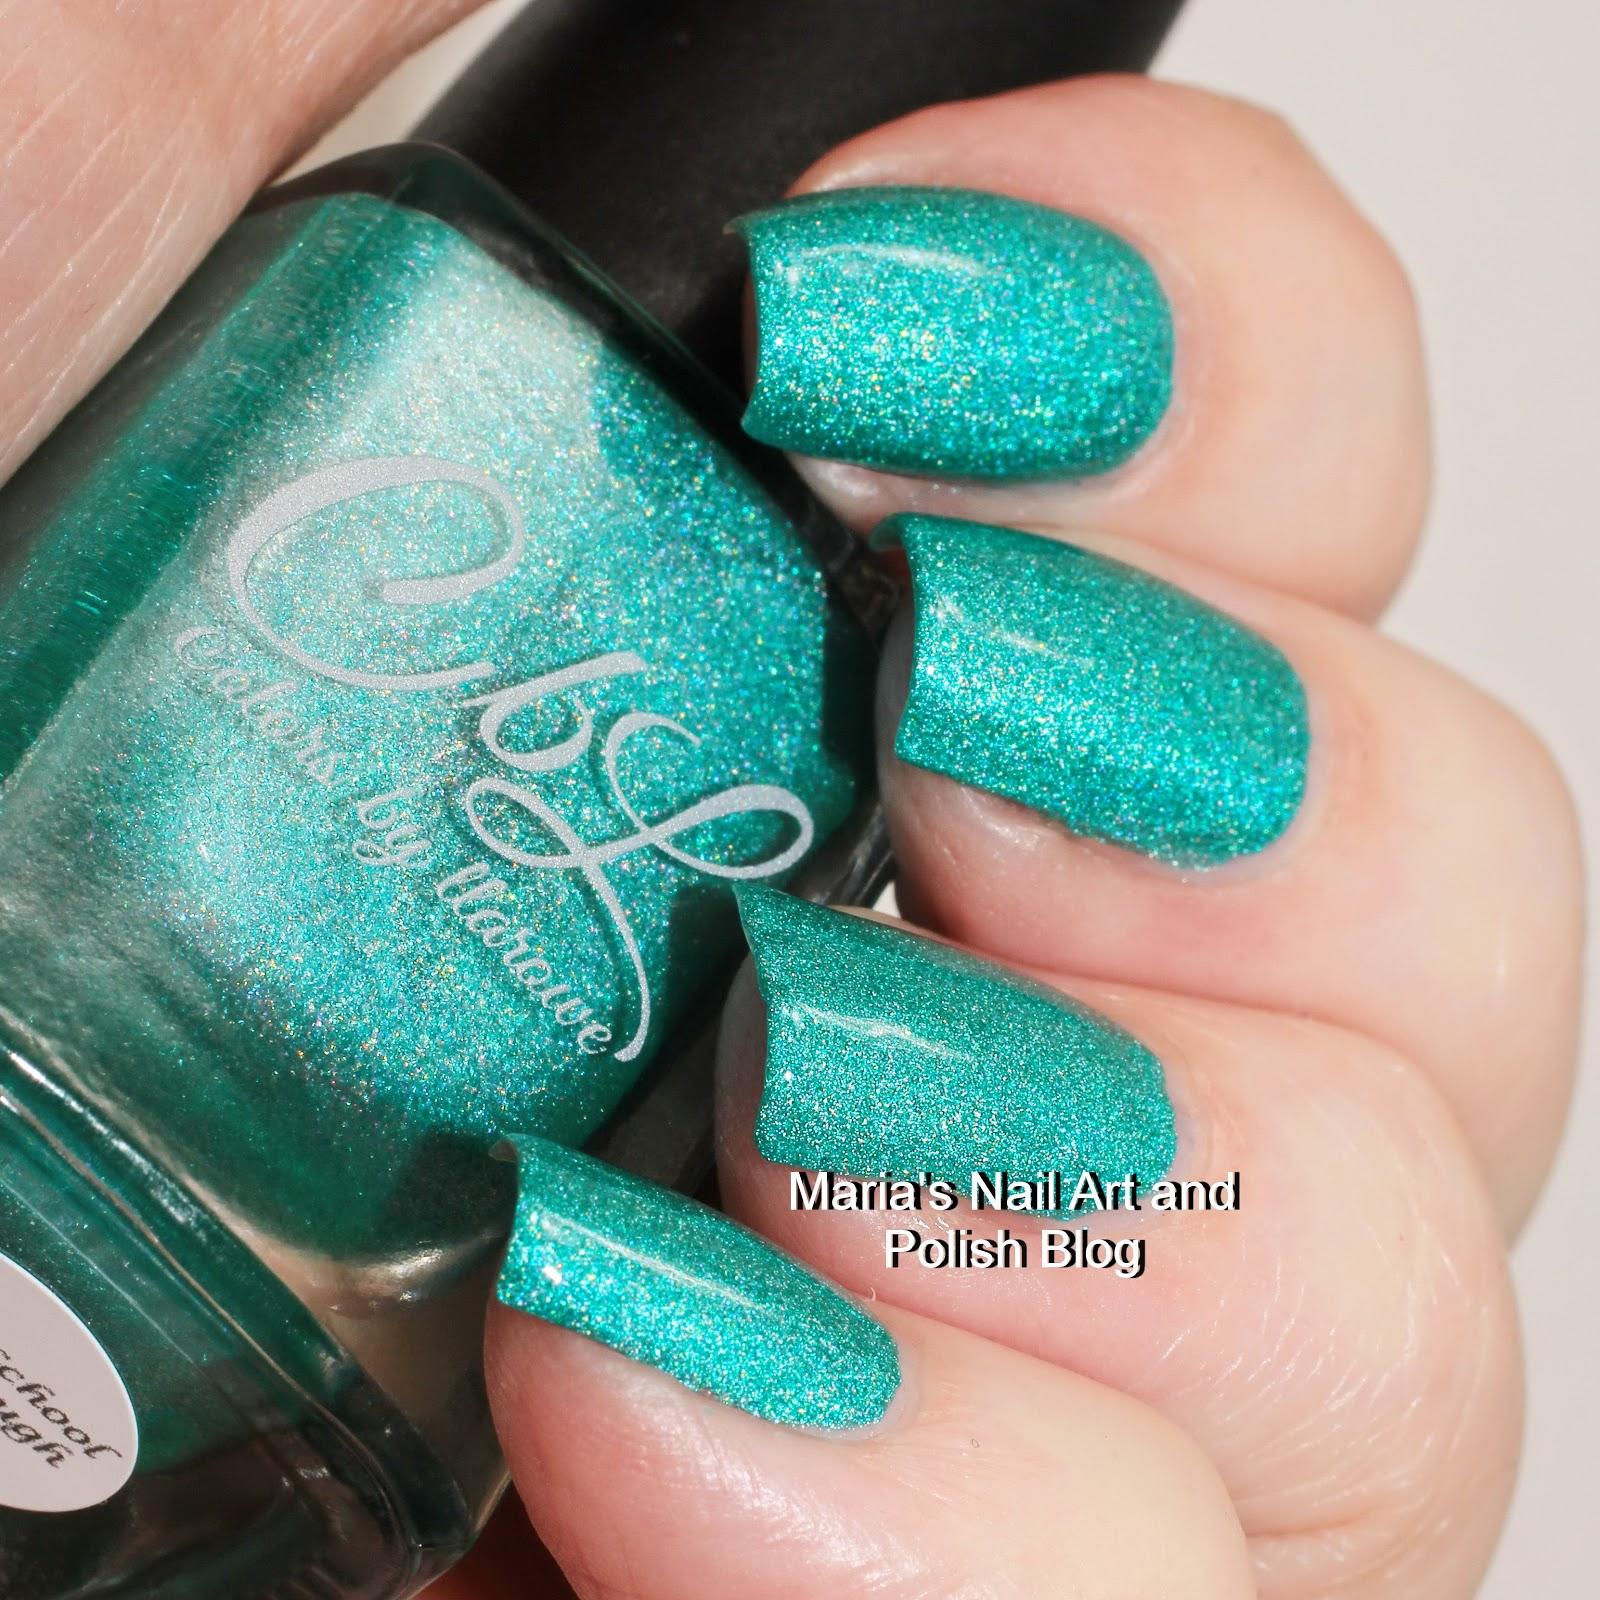 Marias Nail Art And Polish Blog Flushed With Stripes And: Marias Nail Art And Polish Blog: Colors By Llarowe Krispy